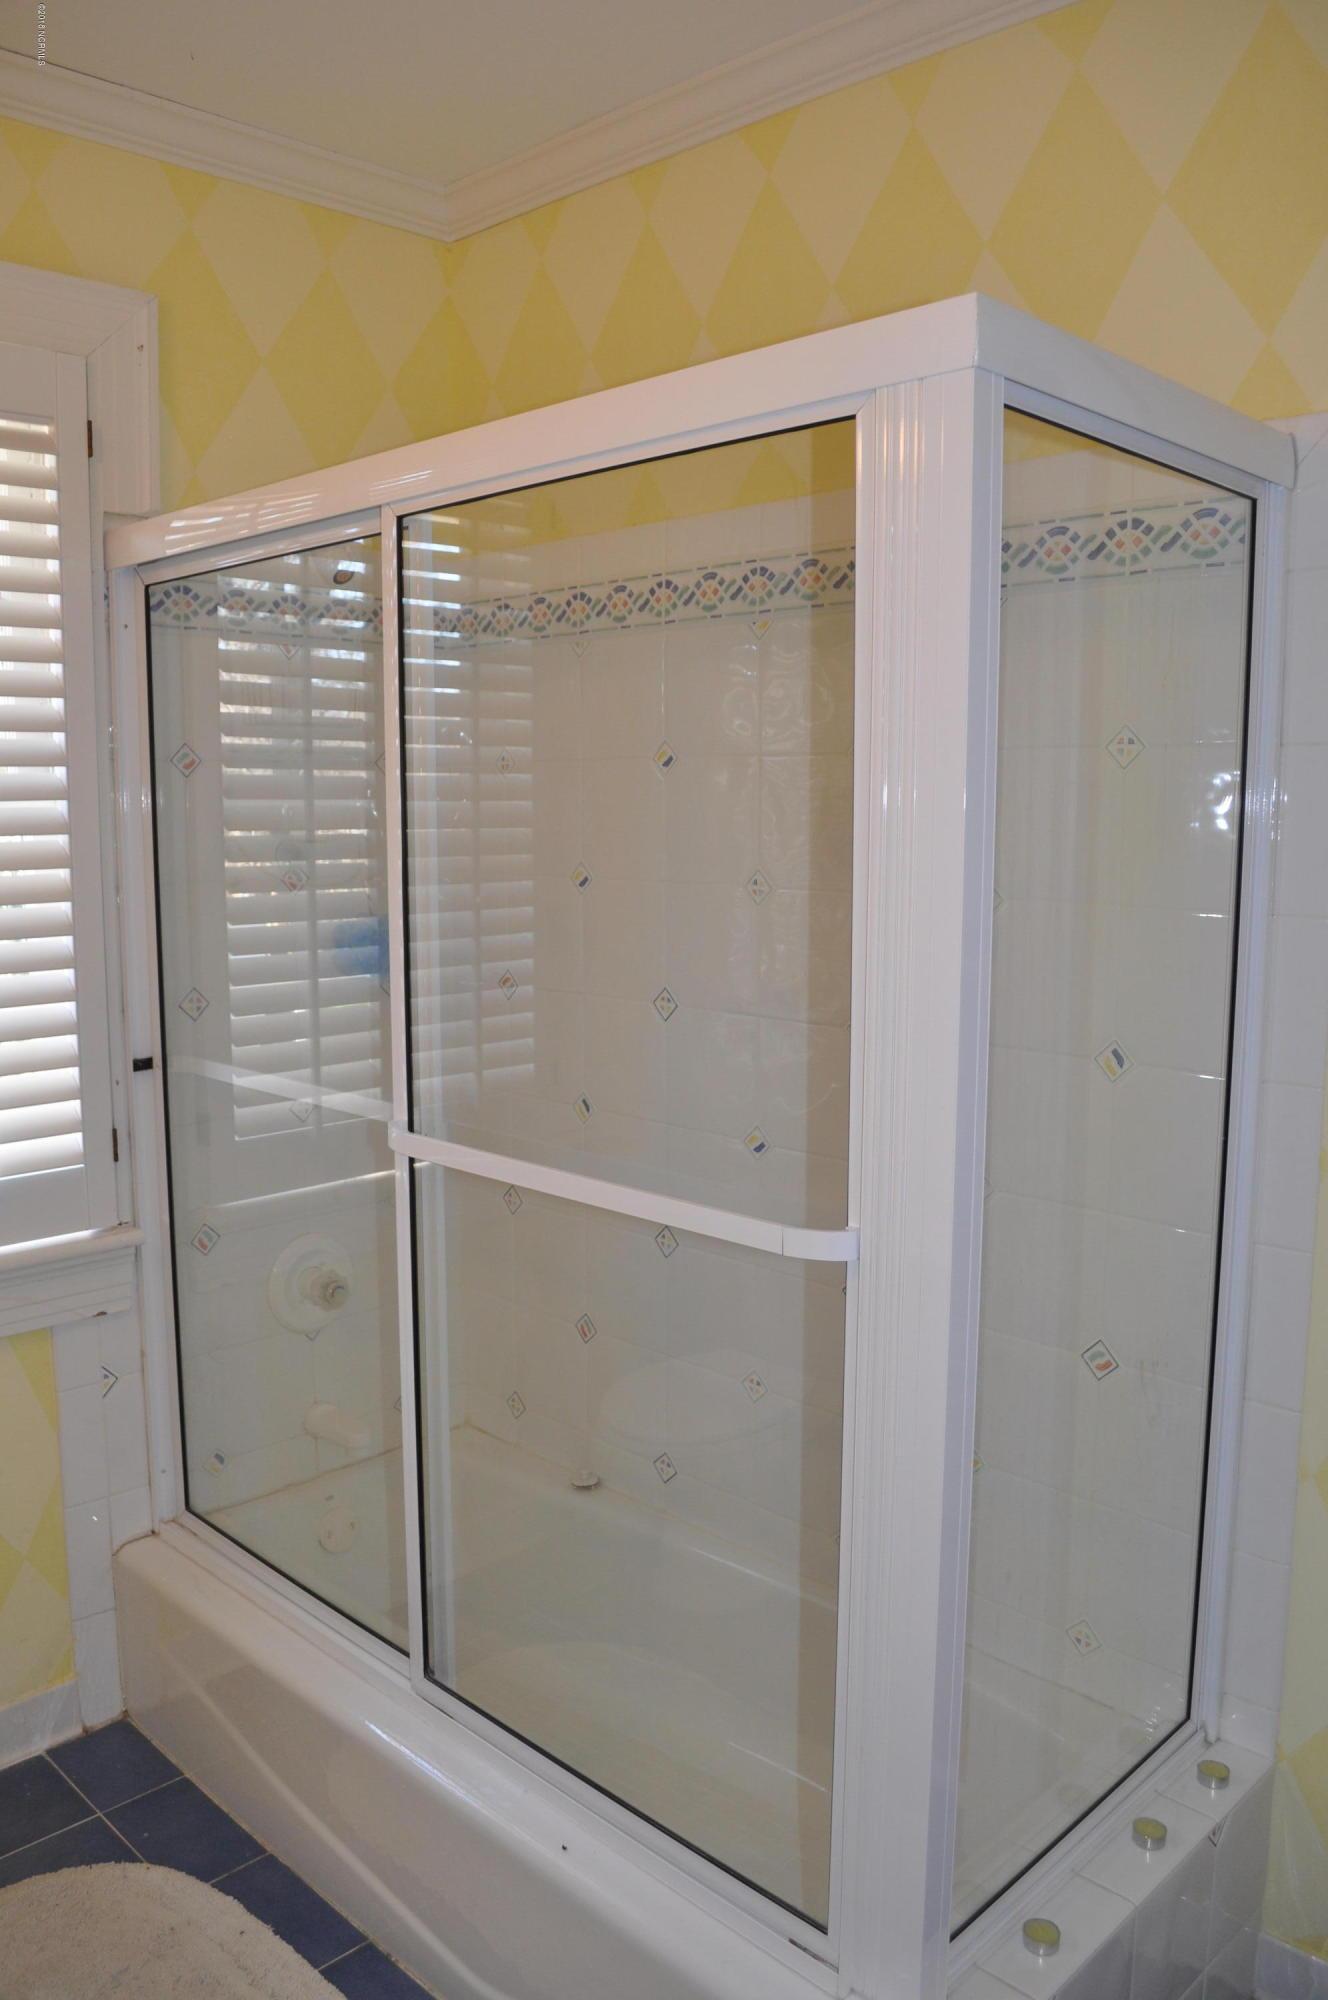 1415 Nash Street, Wilson, North Carolina, 5 Bedrooms Bedrooms, 14 Rooms Rooms,4 BathroomsBathrooms,Single family residence,For sale,Nash,100104756